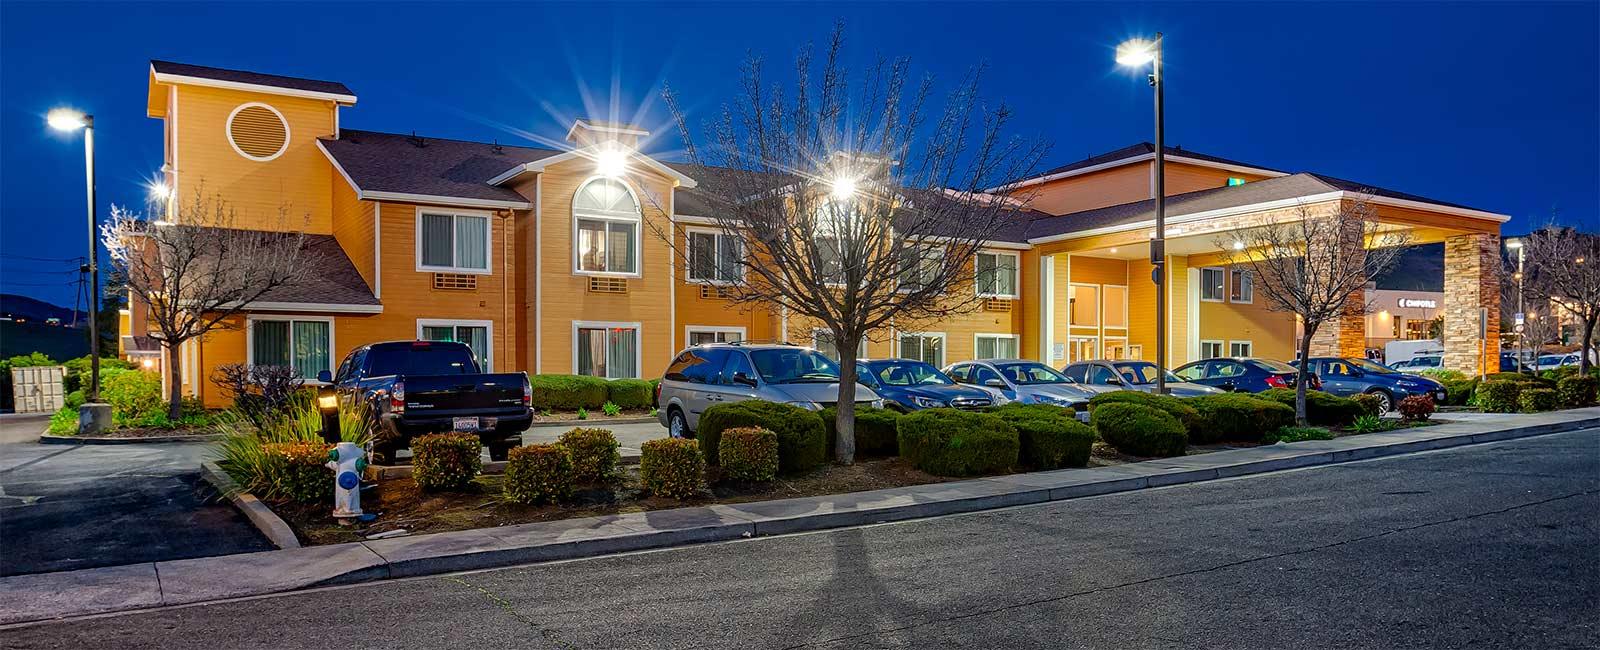 Best Business Hotel Near Vallejo Six Flags | Sixflagshotel.Com